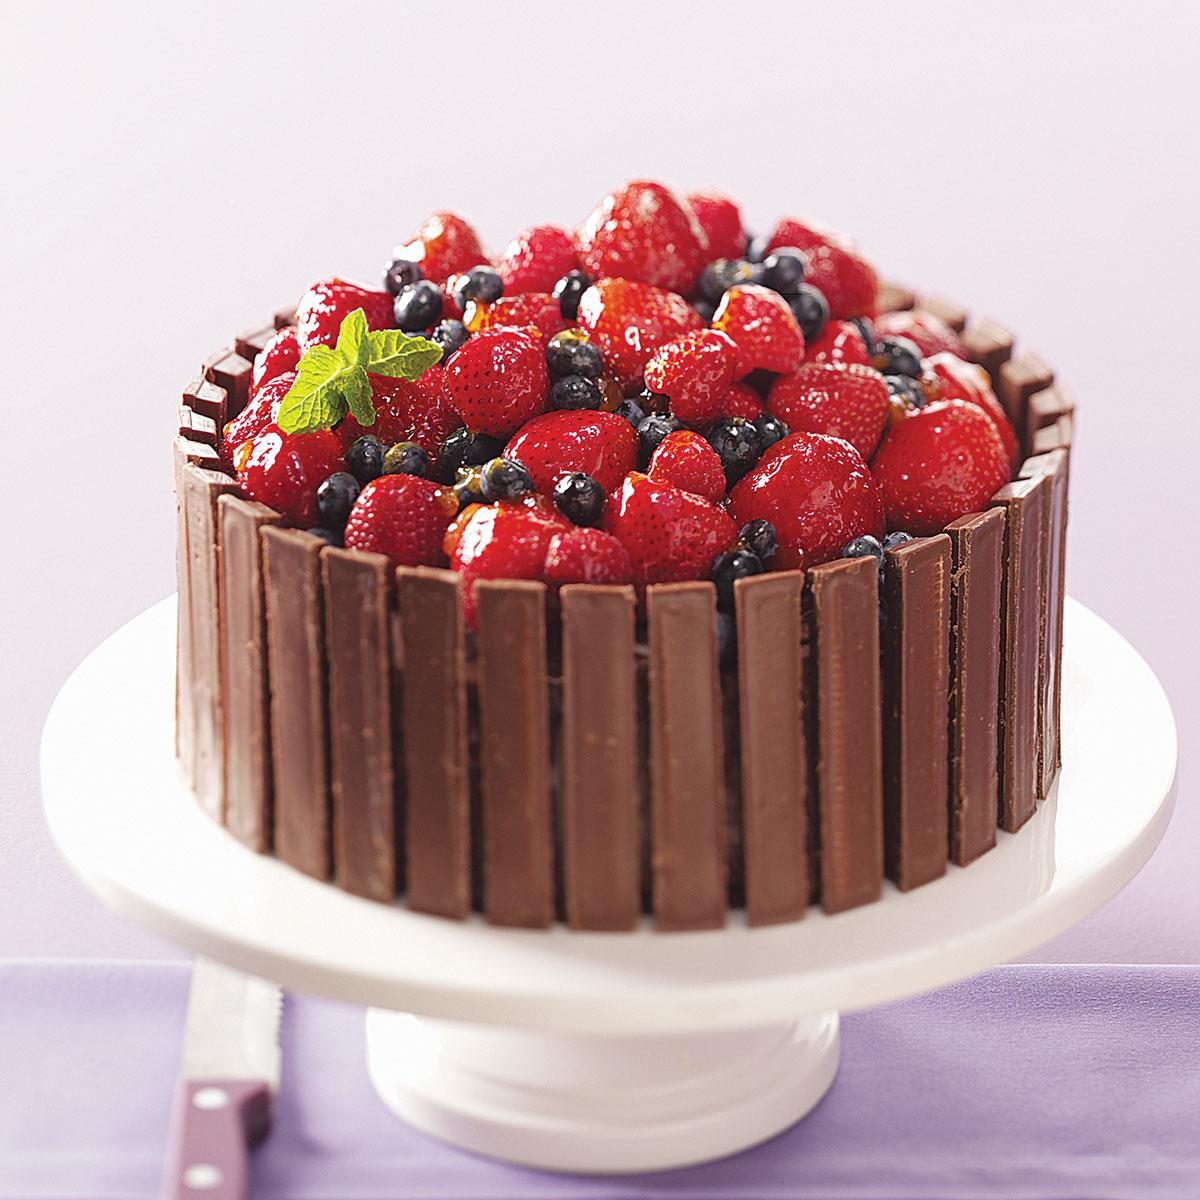 34 Easy Cake Decorating Ideas Taste Of Home